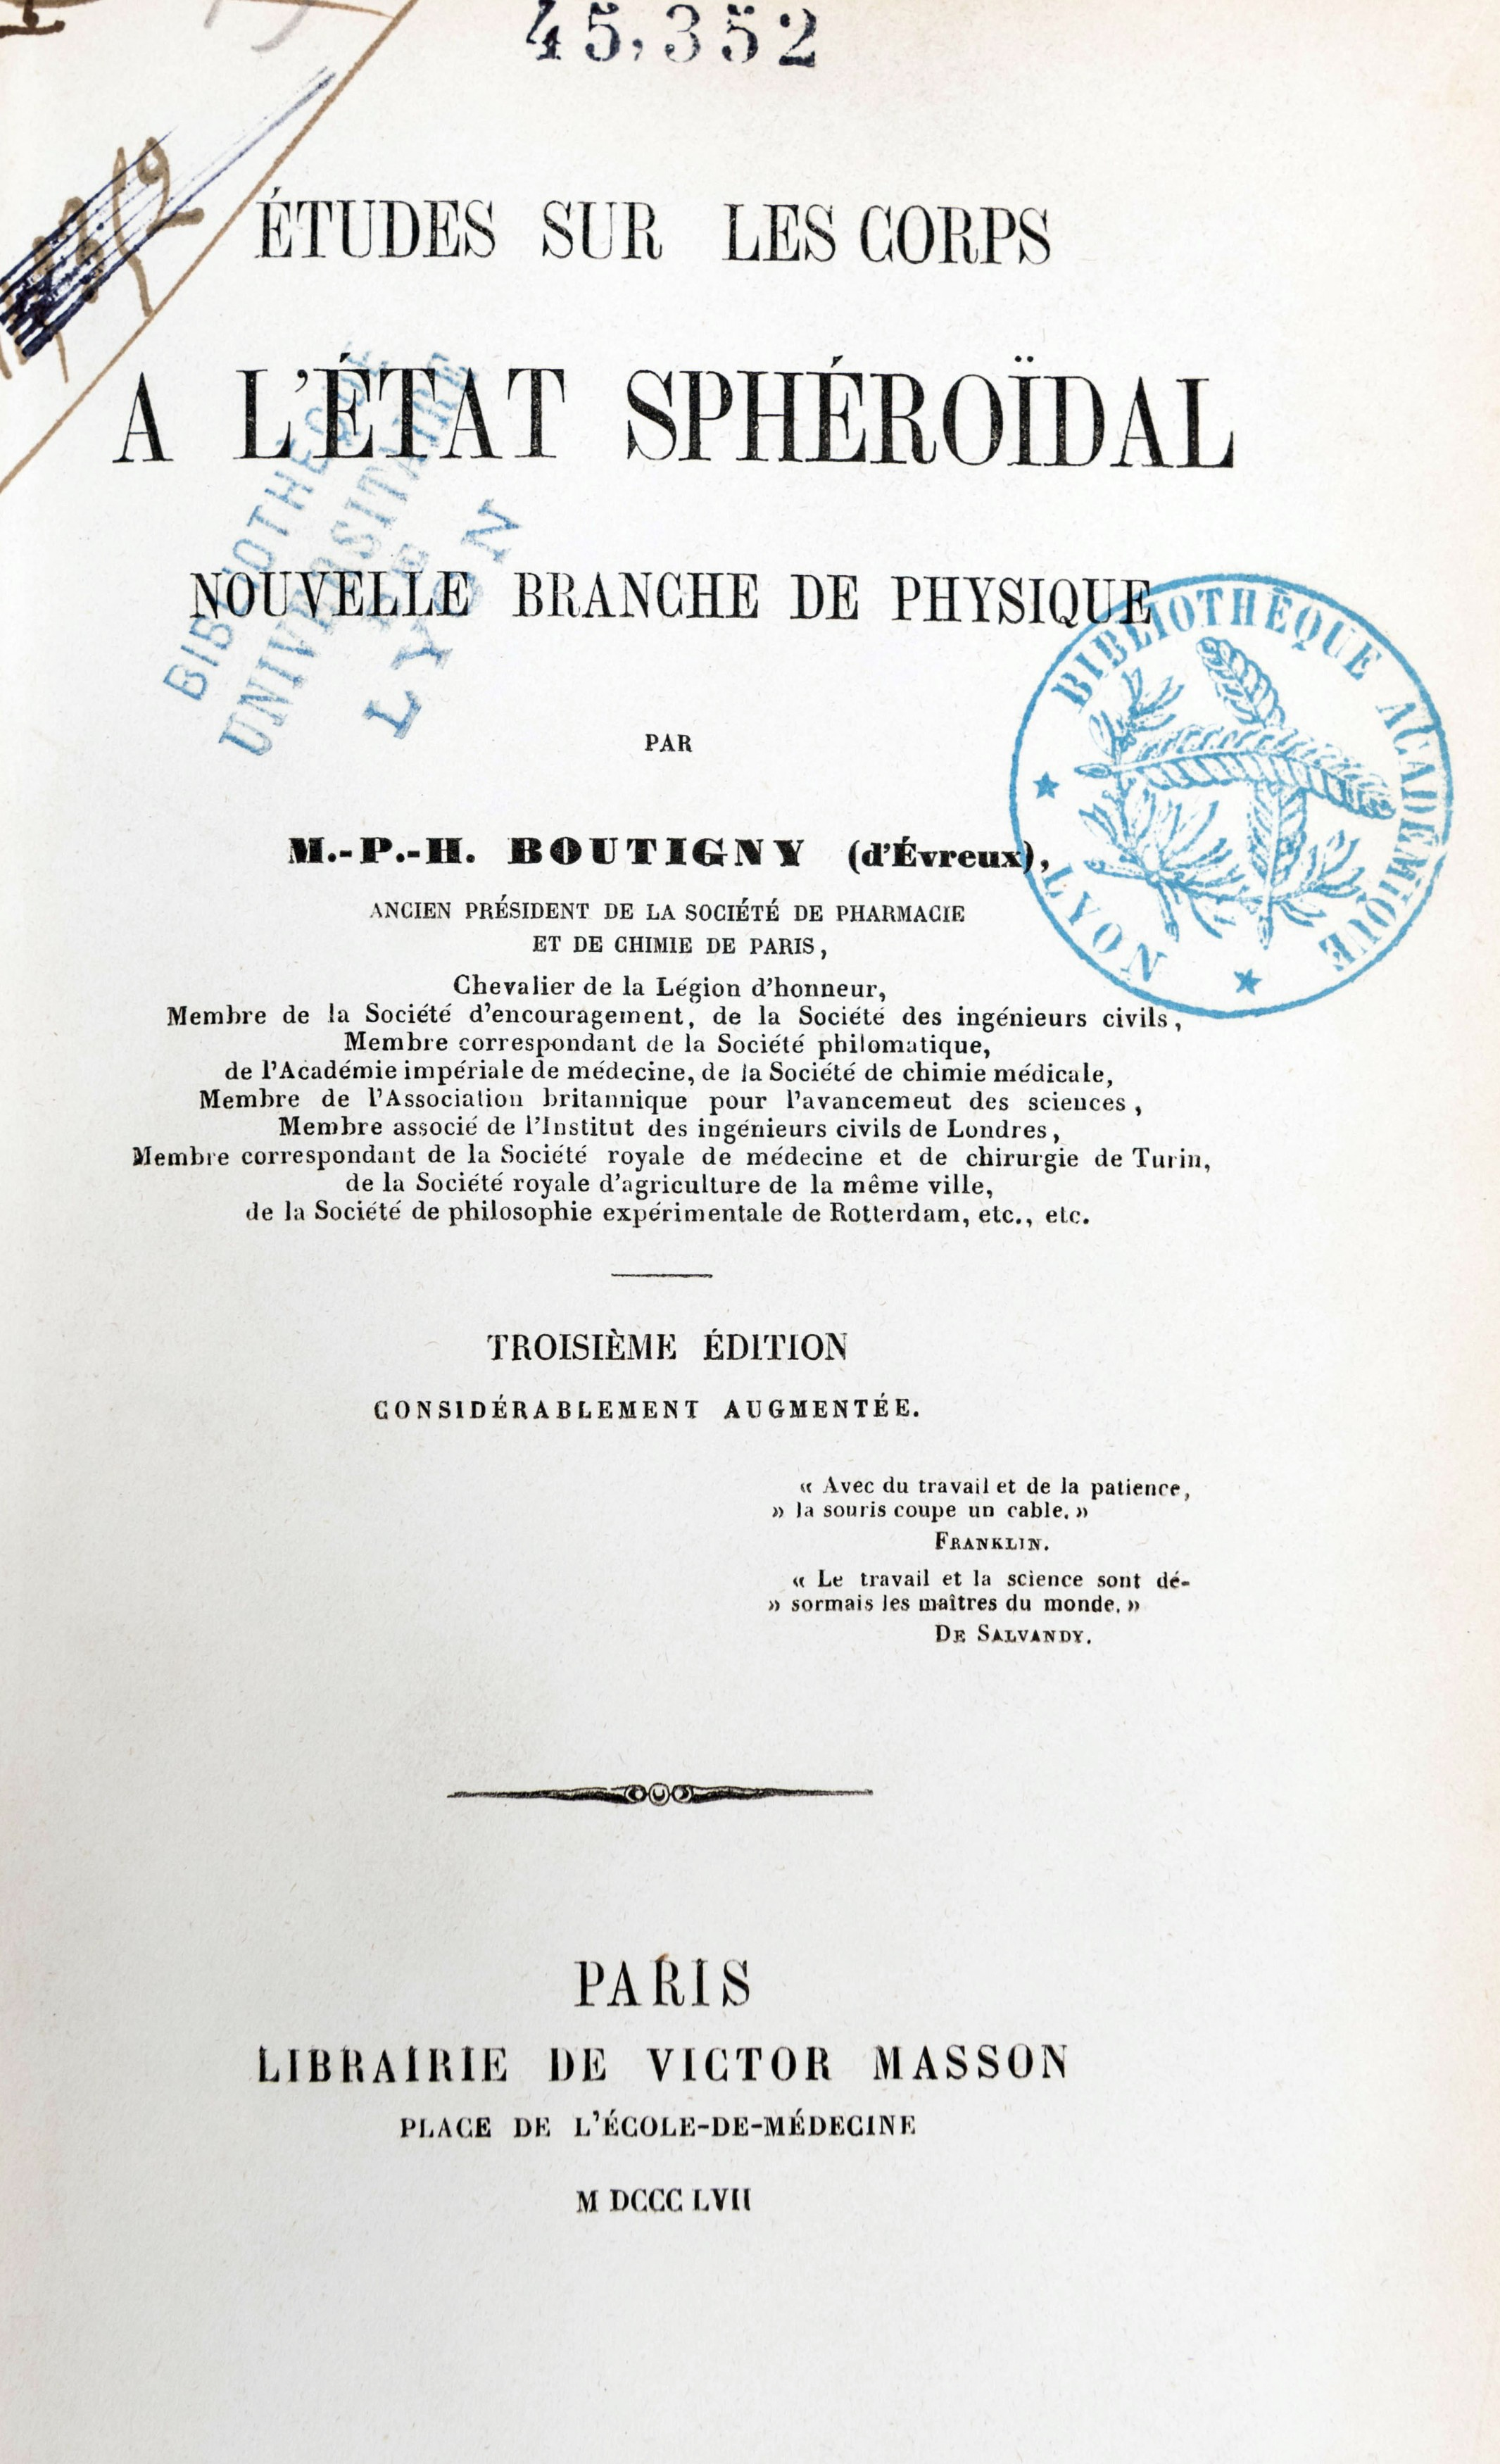 M.P.H. Boutigny (1)